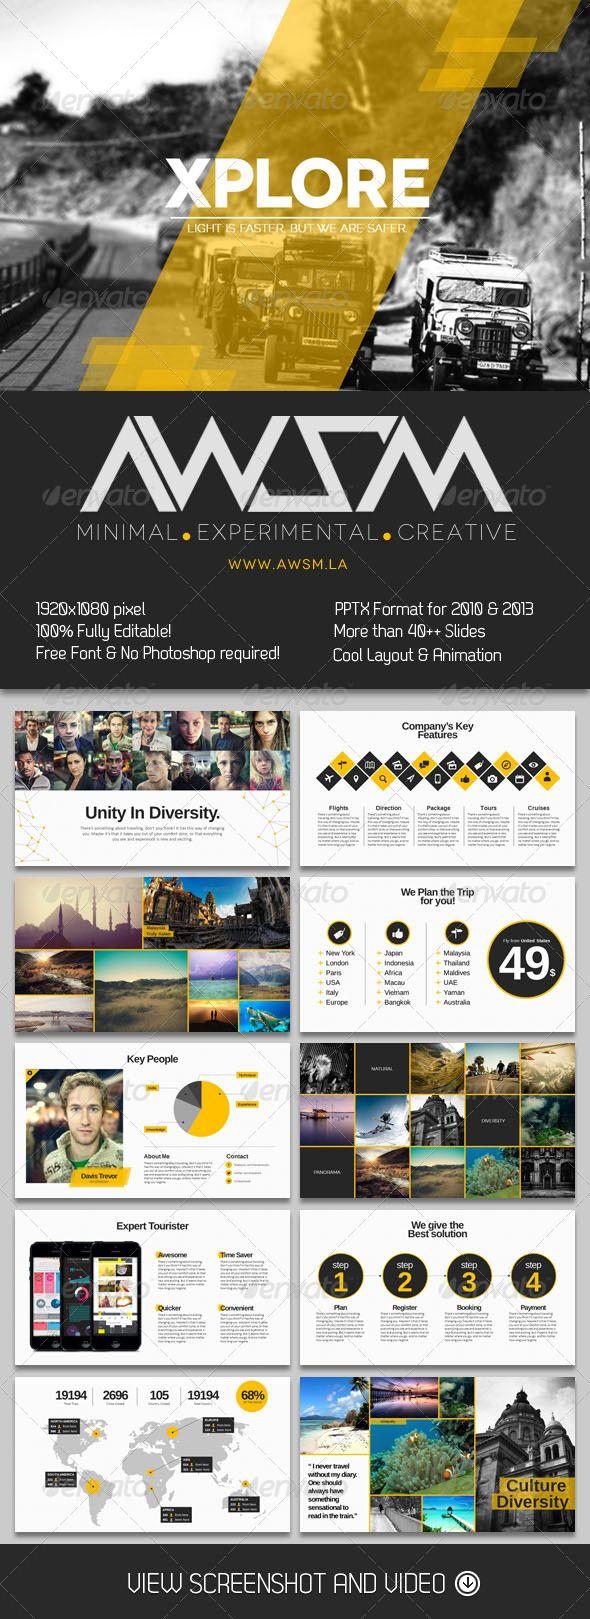 xplore magazine powerpoint presentation - miscellaneous powerpoint, Modern powerpoint